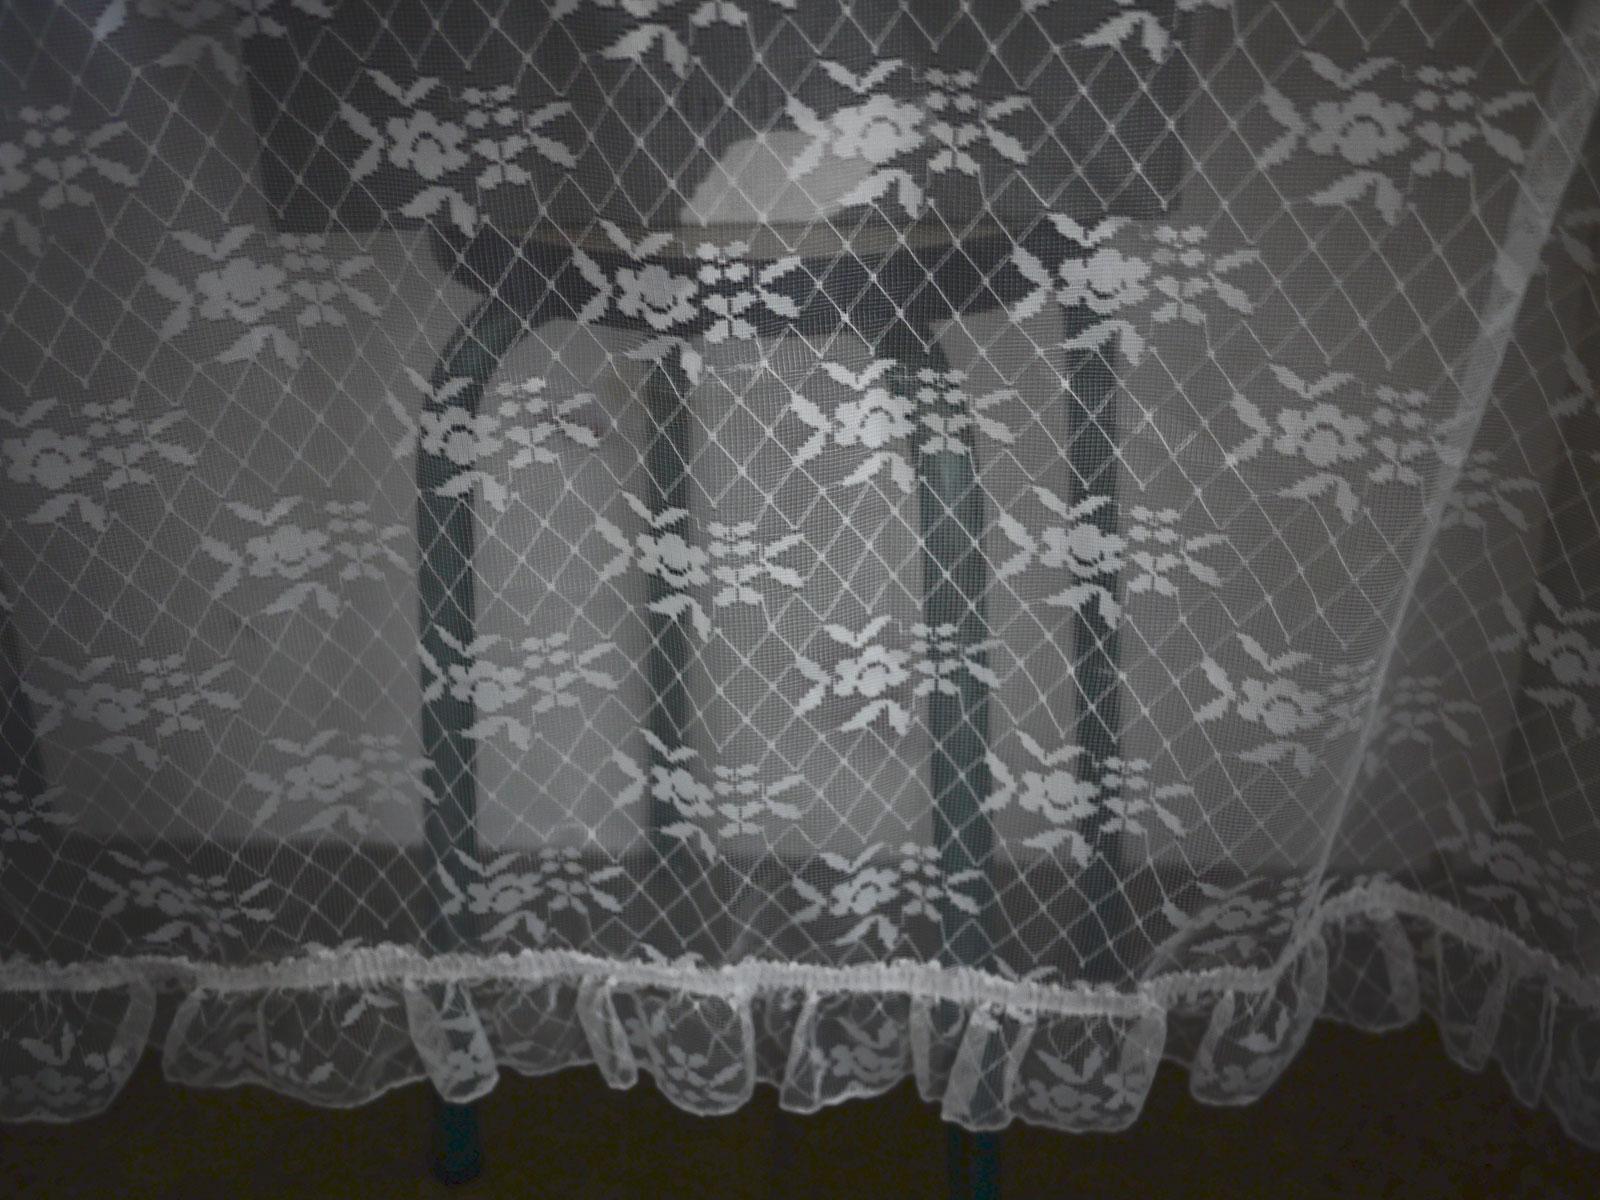 Bracelets LOOM - Design textile by Myriam Balaÿ myriam-balay-rideau DETAILS L'appartement